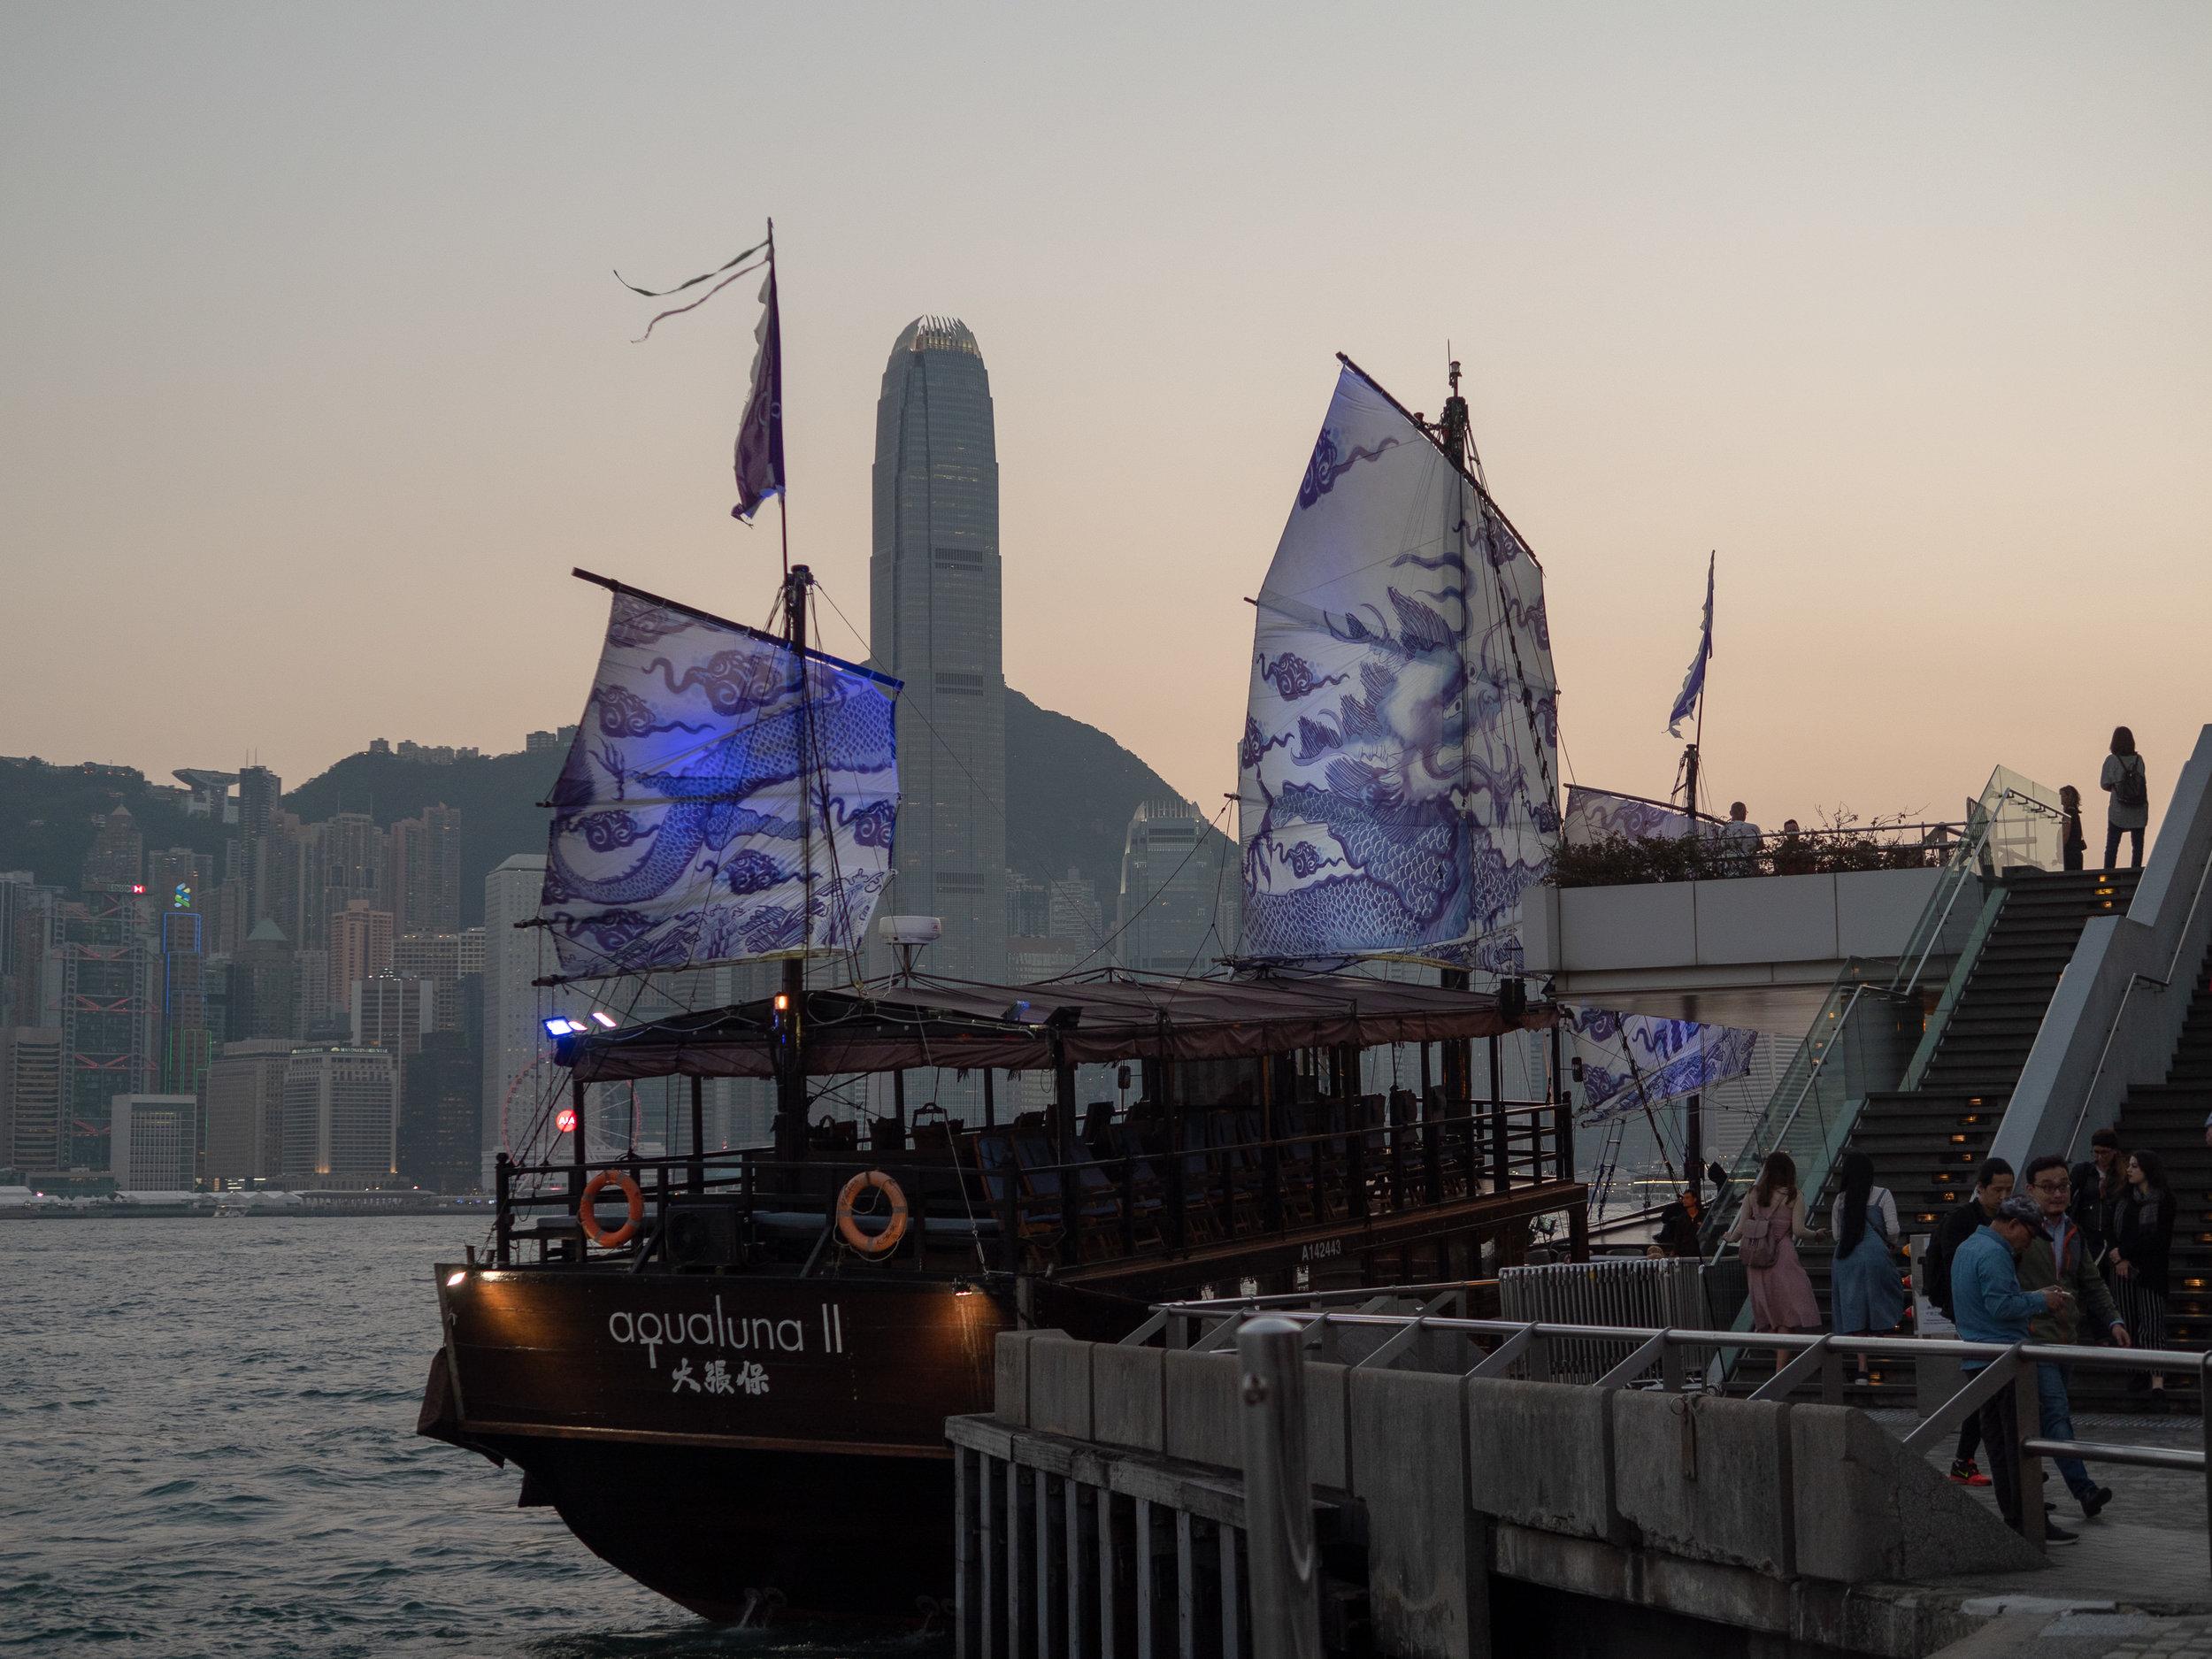 mybelonging-tommylei-the-aqualuna-II-experience-tsim-sha-tsui-promenade-harbor-hong-kong-travel-photography3.jpg